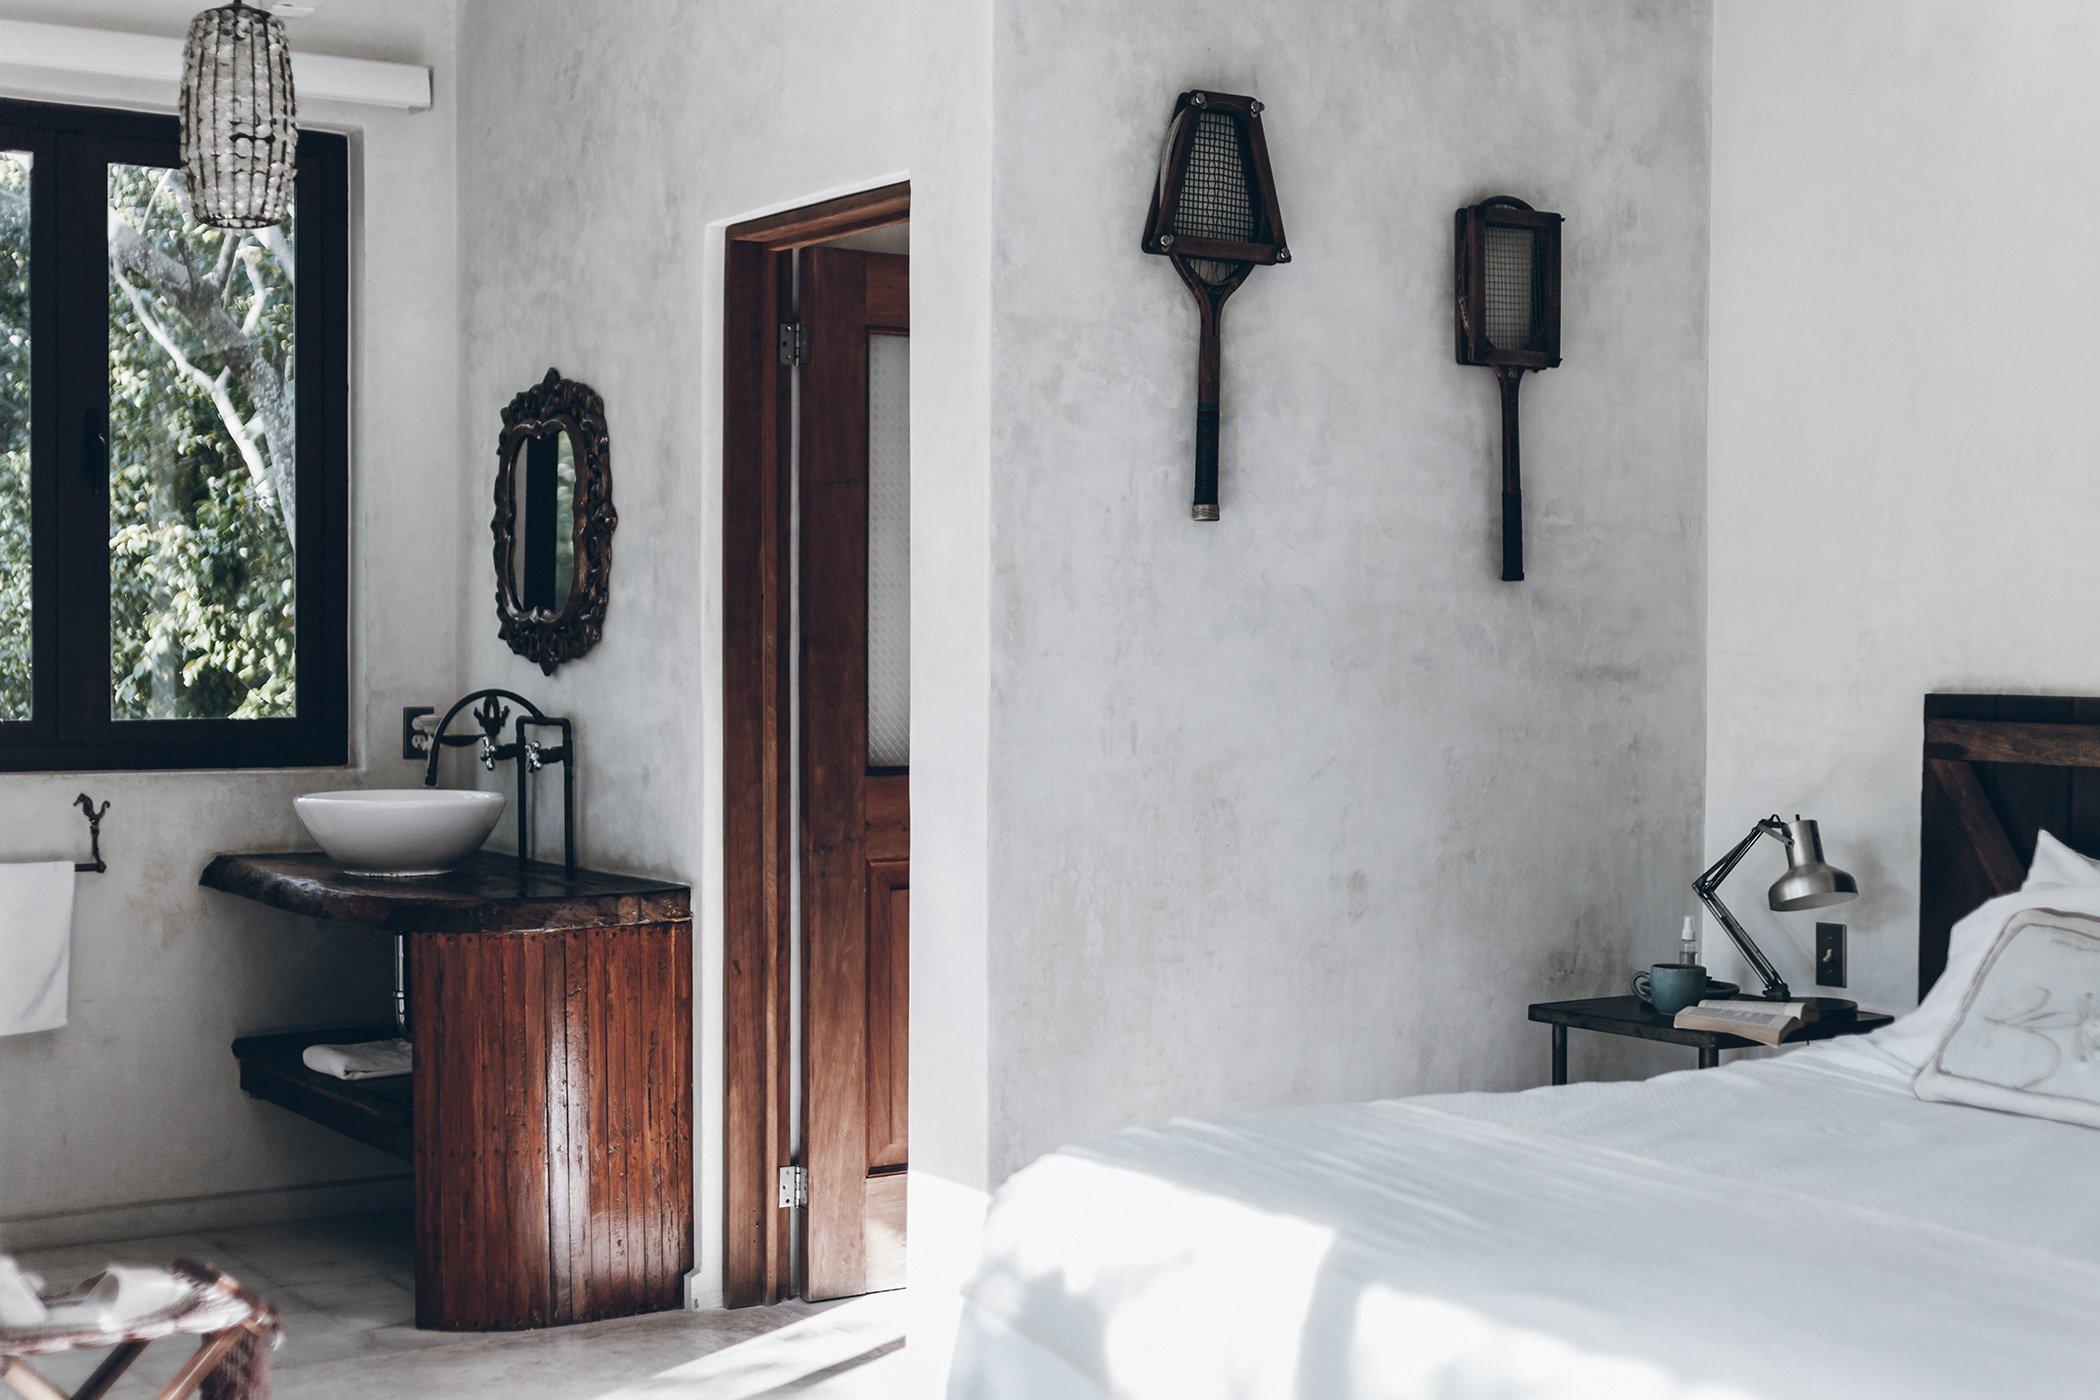 mikuta-la-semilla-hotel-playa-del-carmen-mexico-7